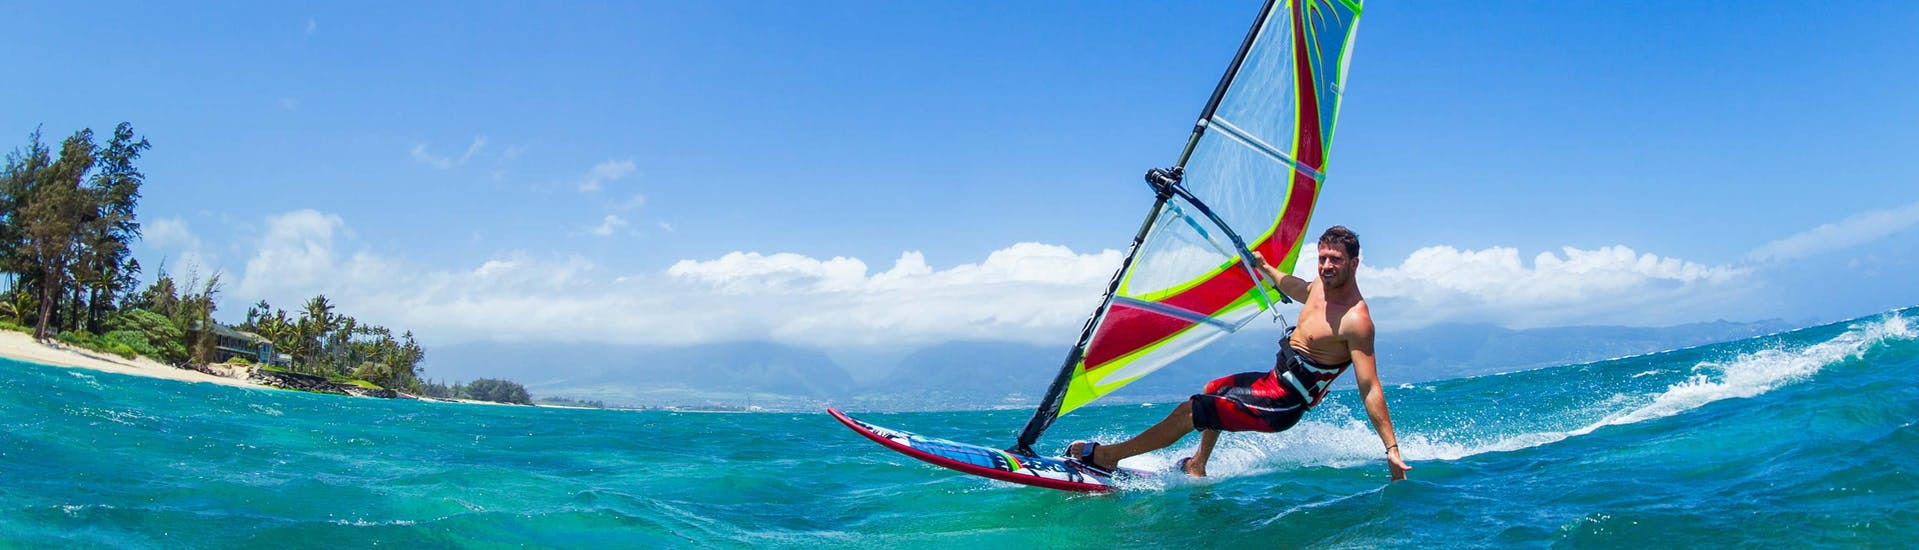 Kitesurfing & Windsurfing (c) Shutterstock